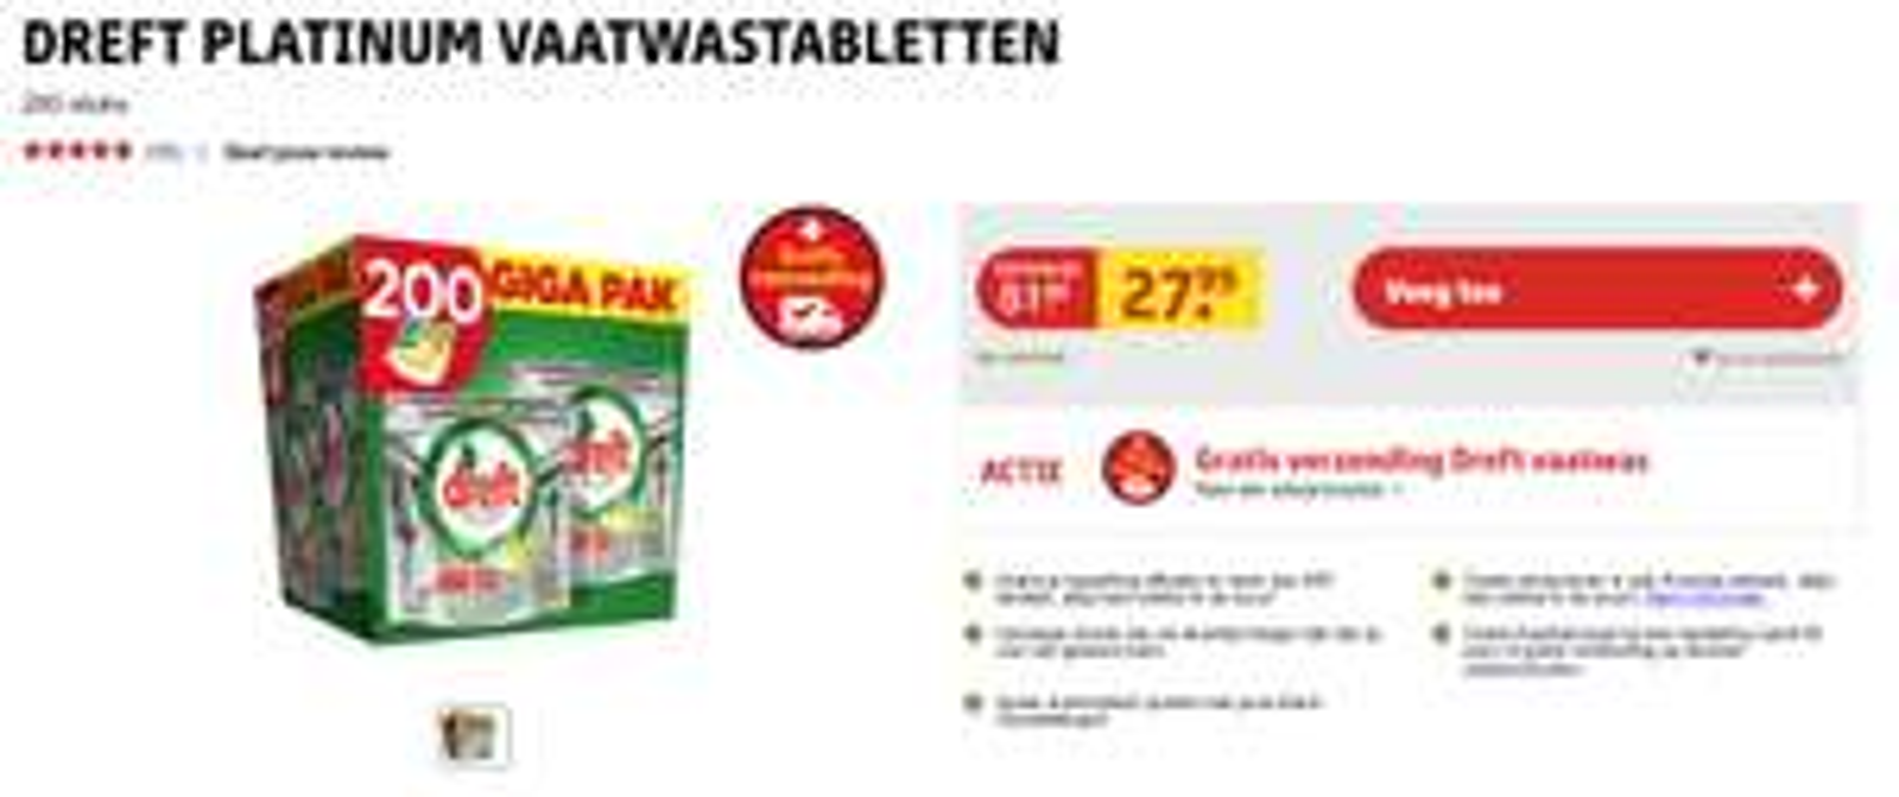 200 Dreft Platinum vaatwastabletten voor EUR 27,99 ==> 14 cent per tablet